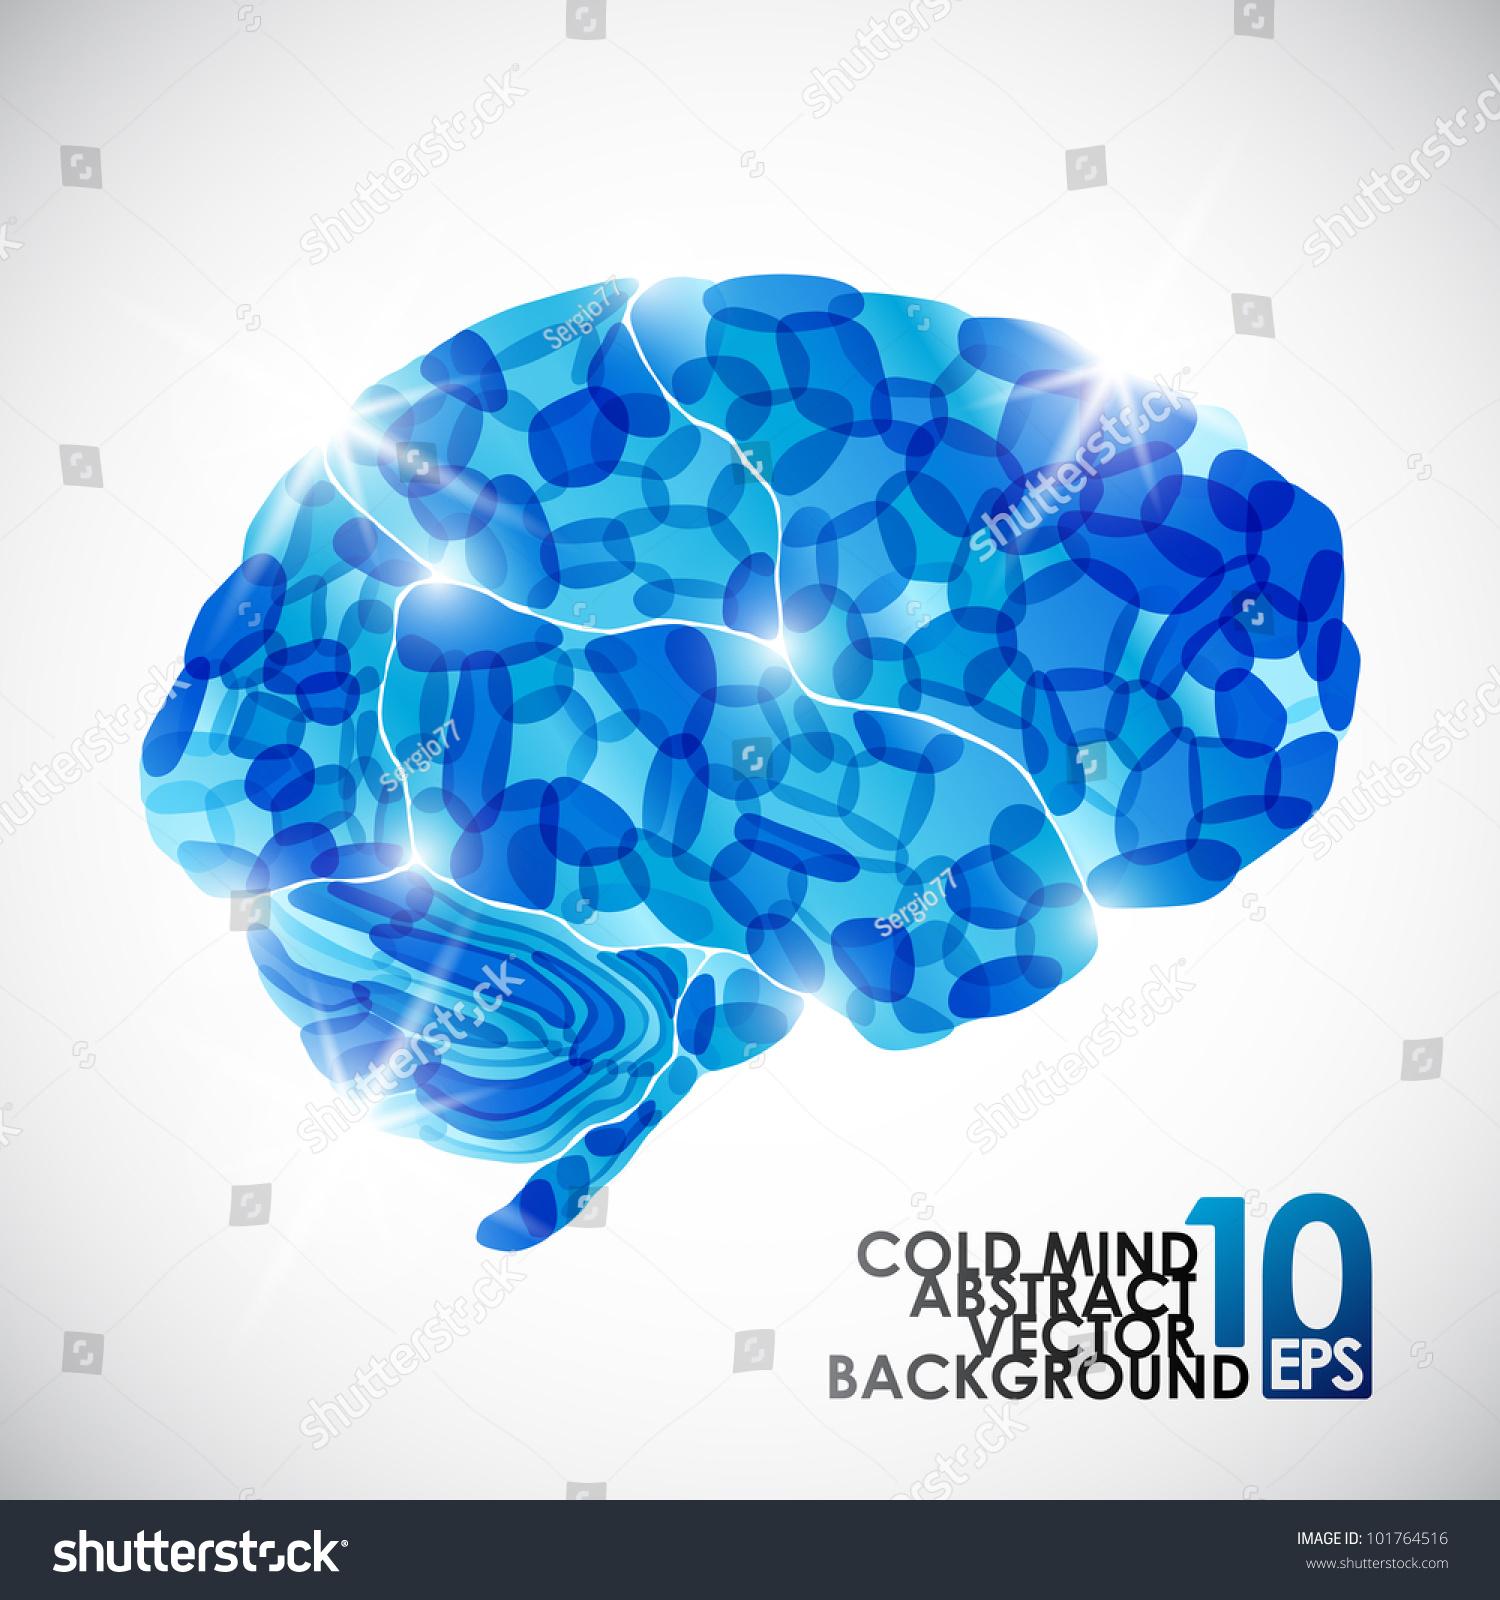 abstract brain wallpaper mind - photo #38